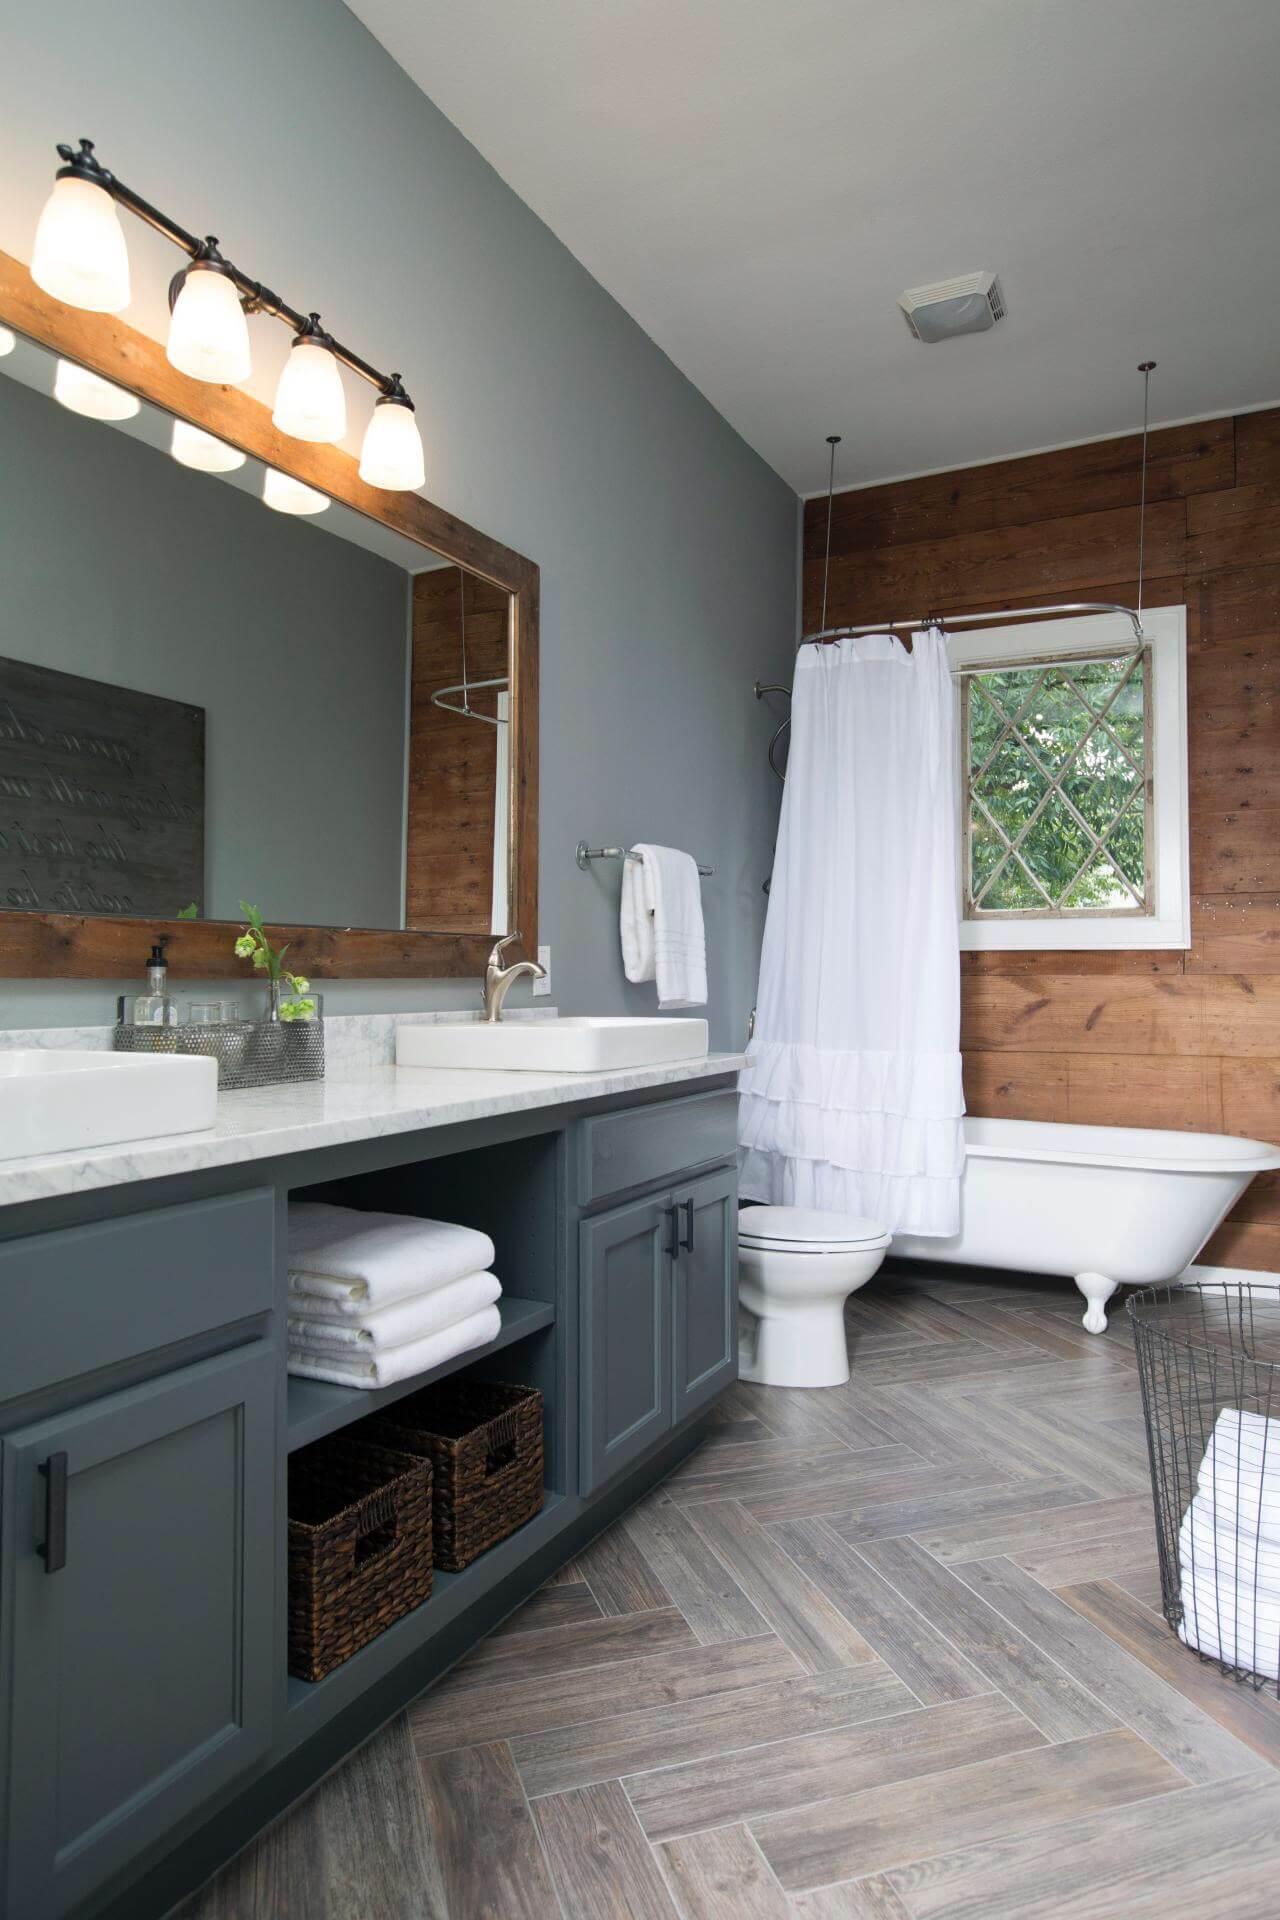 32 Best Master Bathroom Ideas and Designs for 2020 on Popular Bathroom Ideas  id=17431